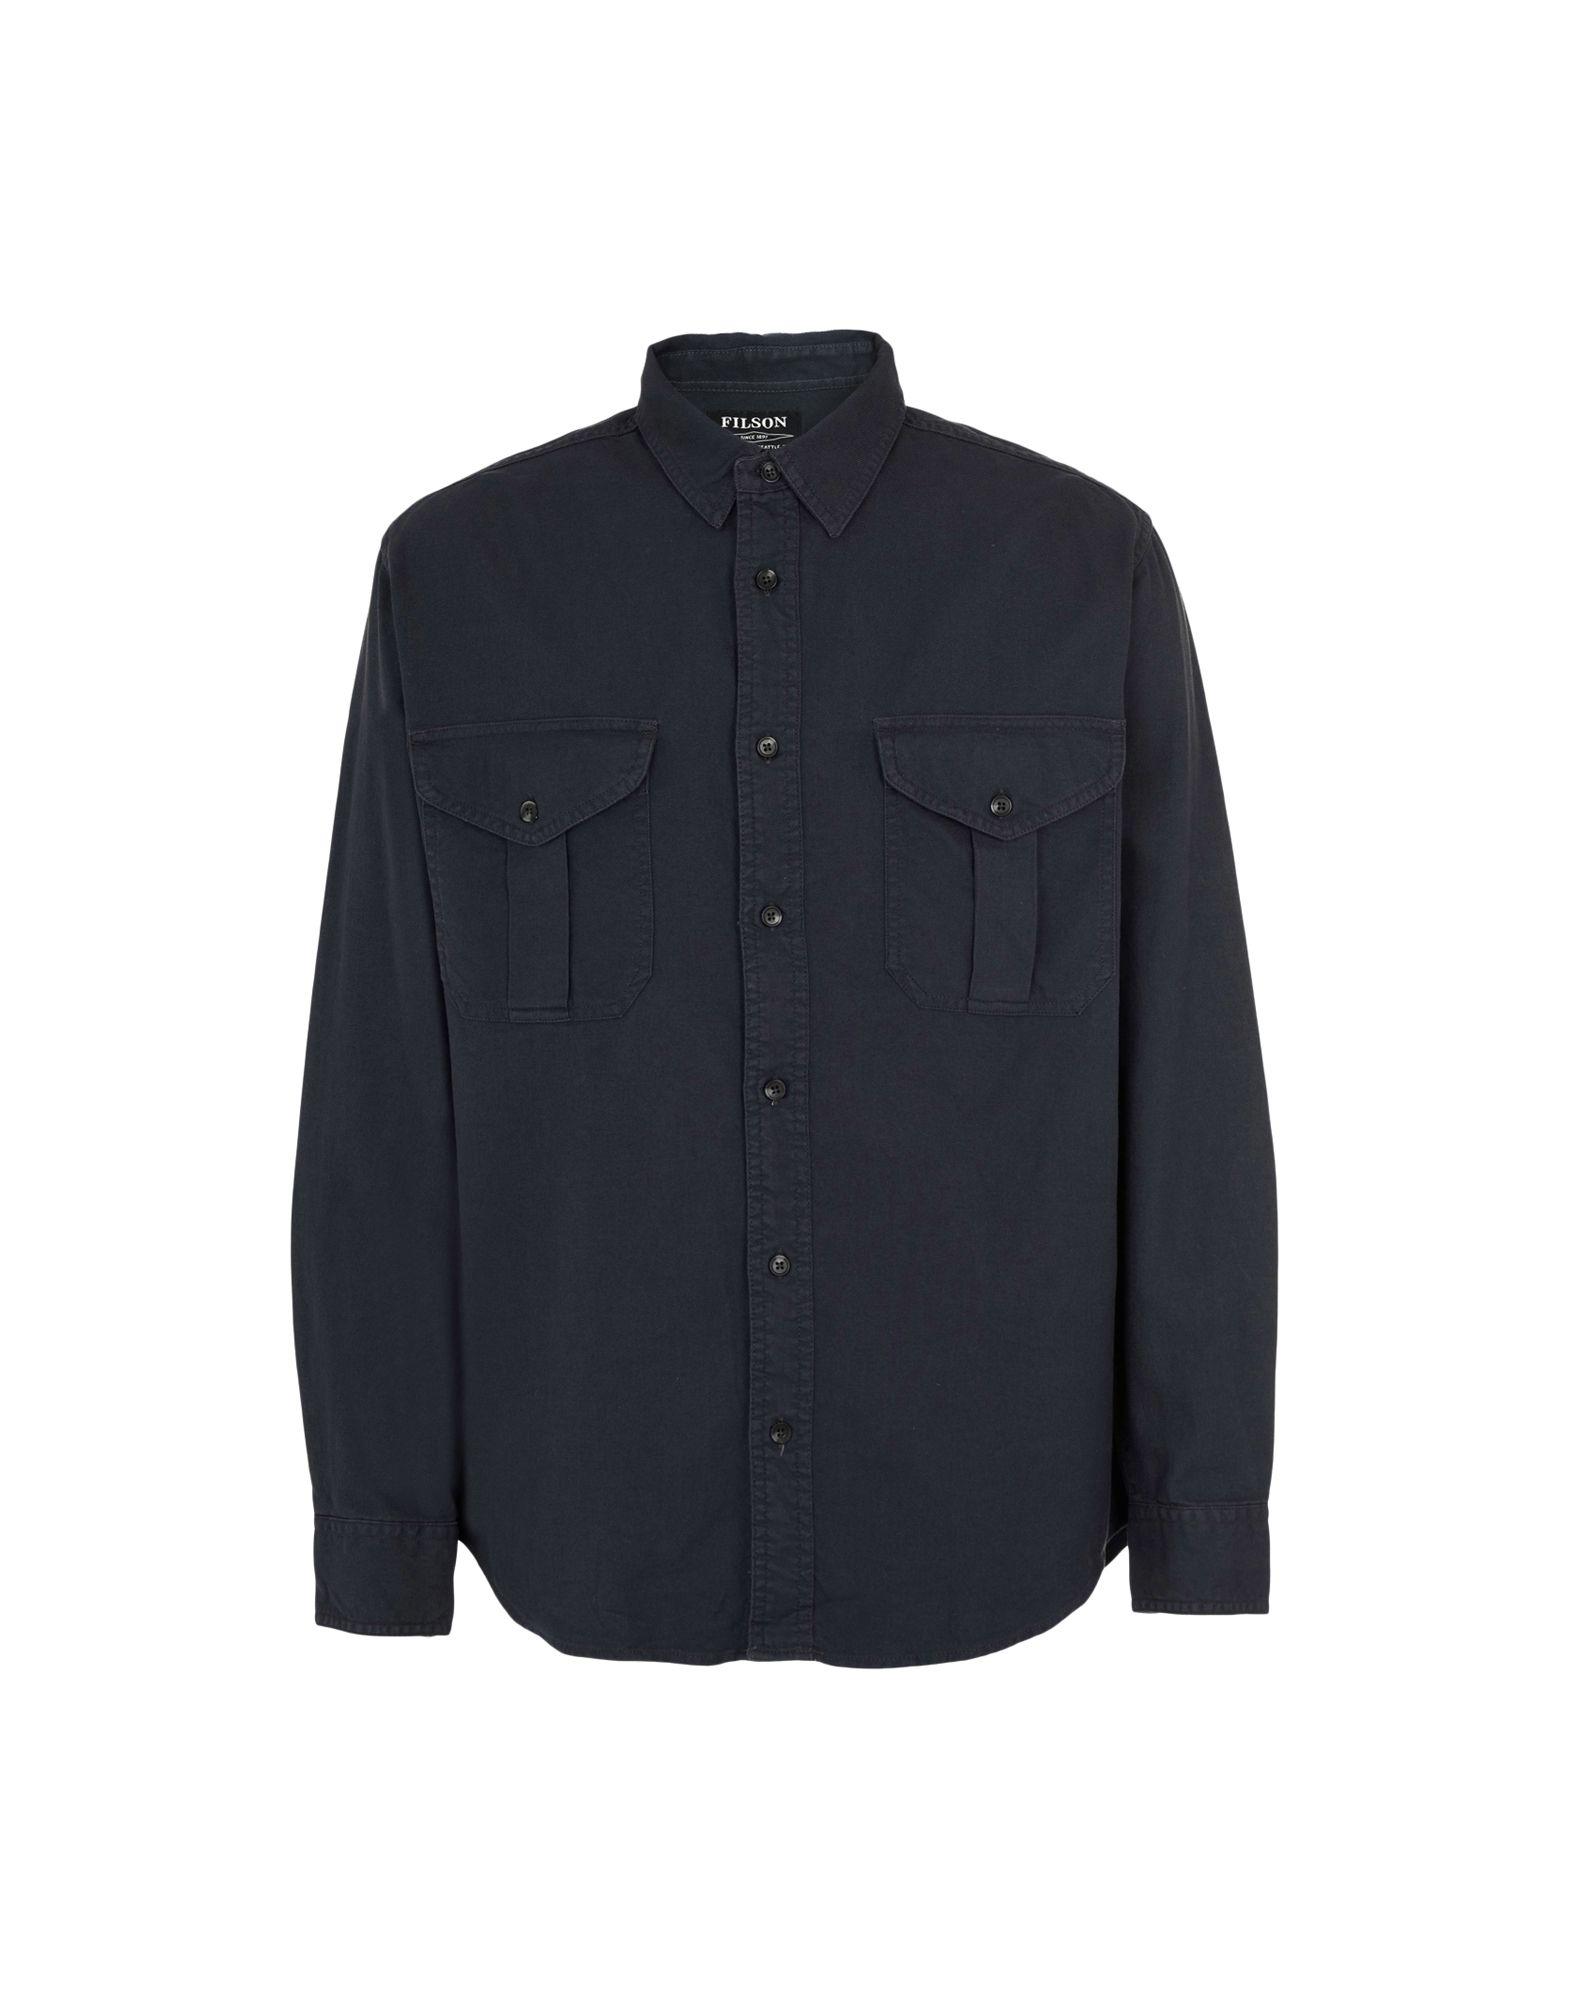 Camicia Tinta Unita Filson Lt Wt Alaskan Guide Shirt / Lt Wt Alaskan Guide Shirt - Uomo - Acquista online su